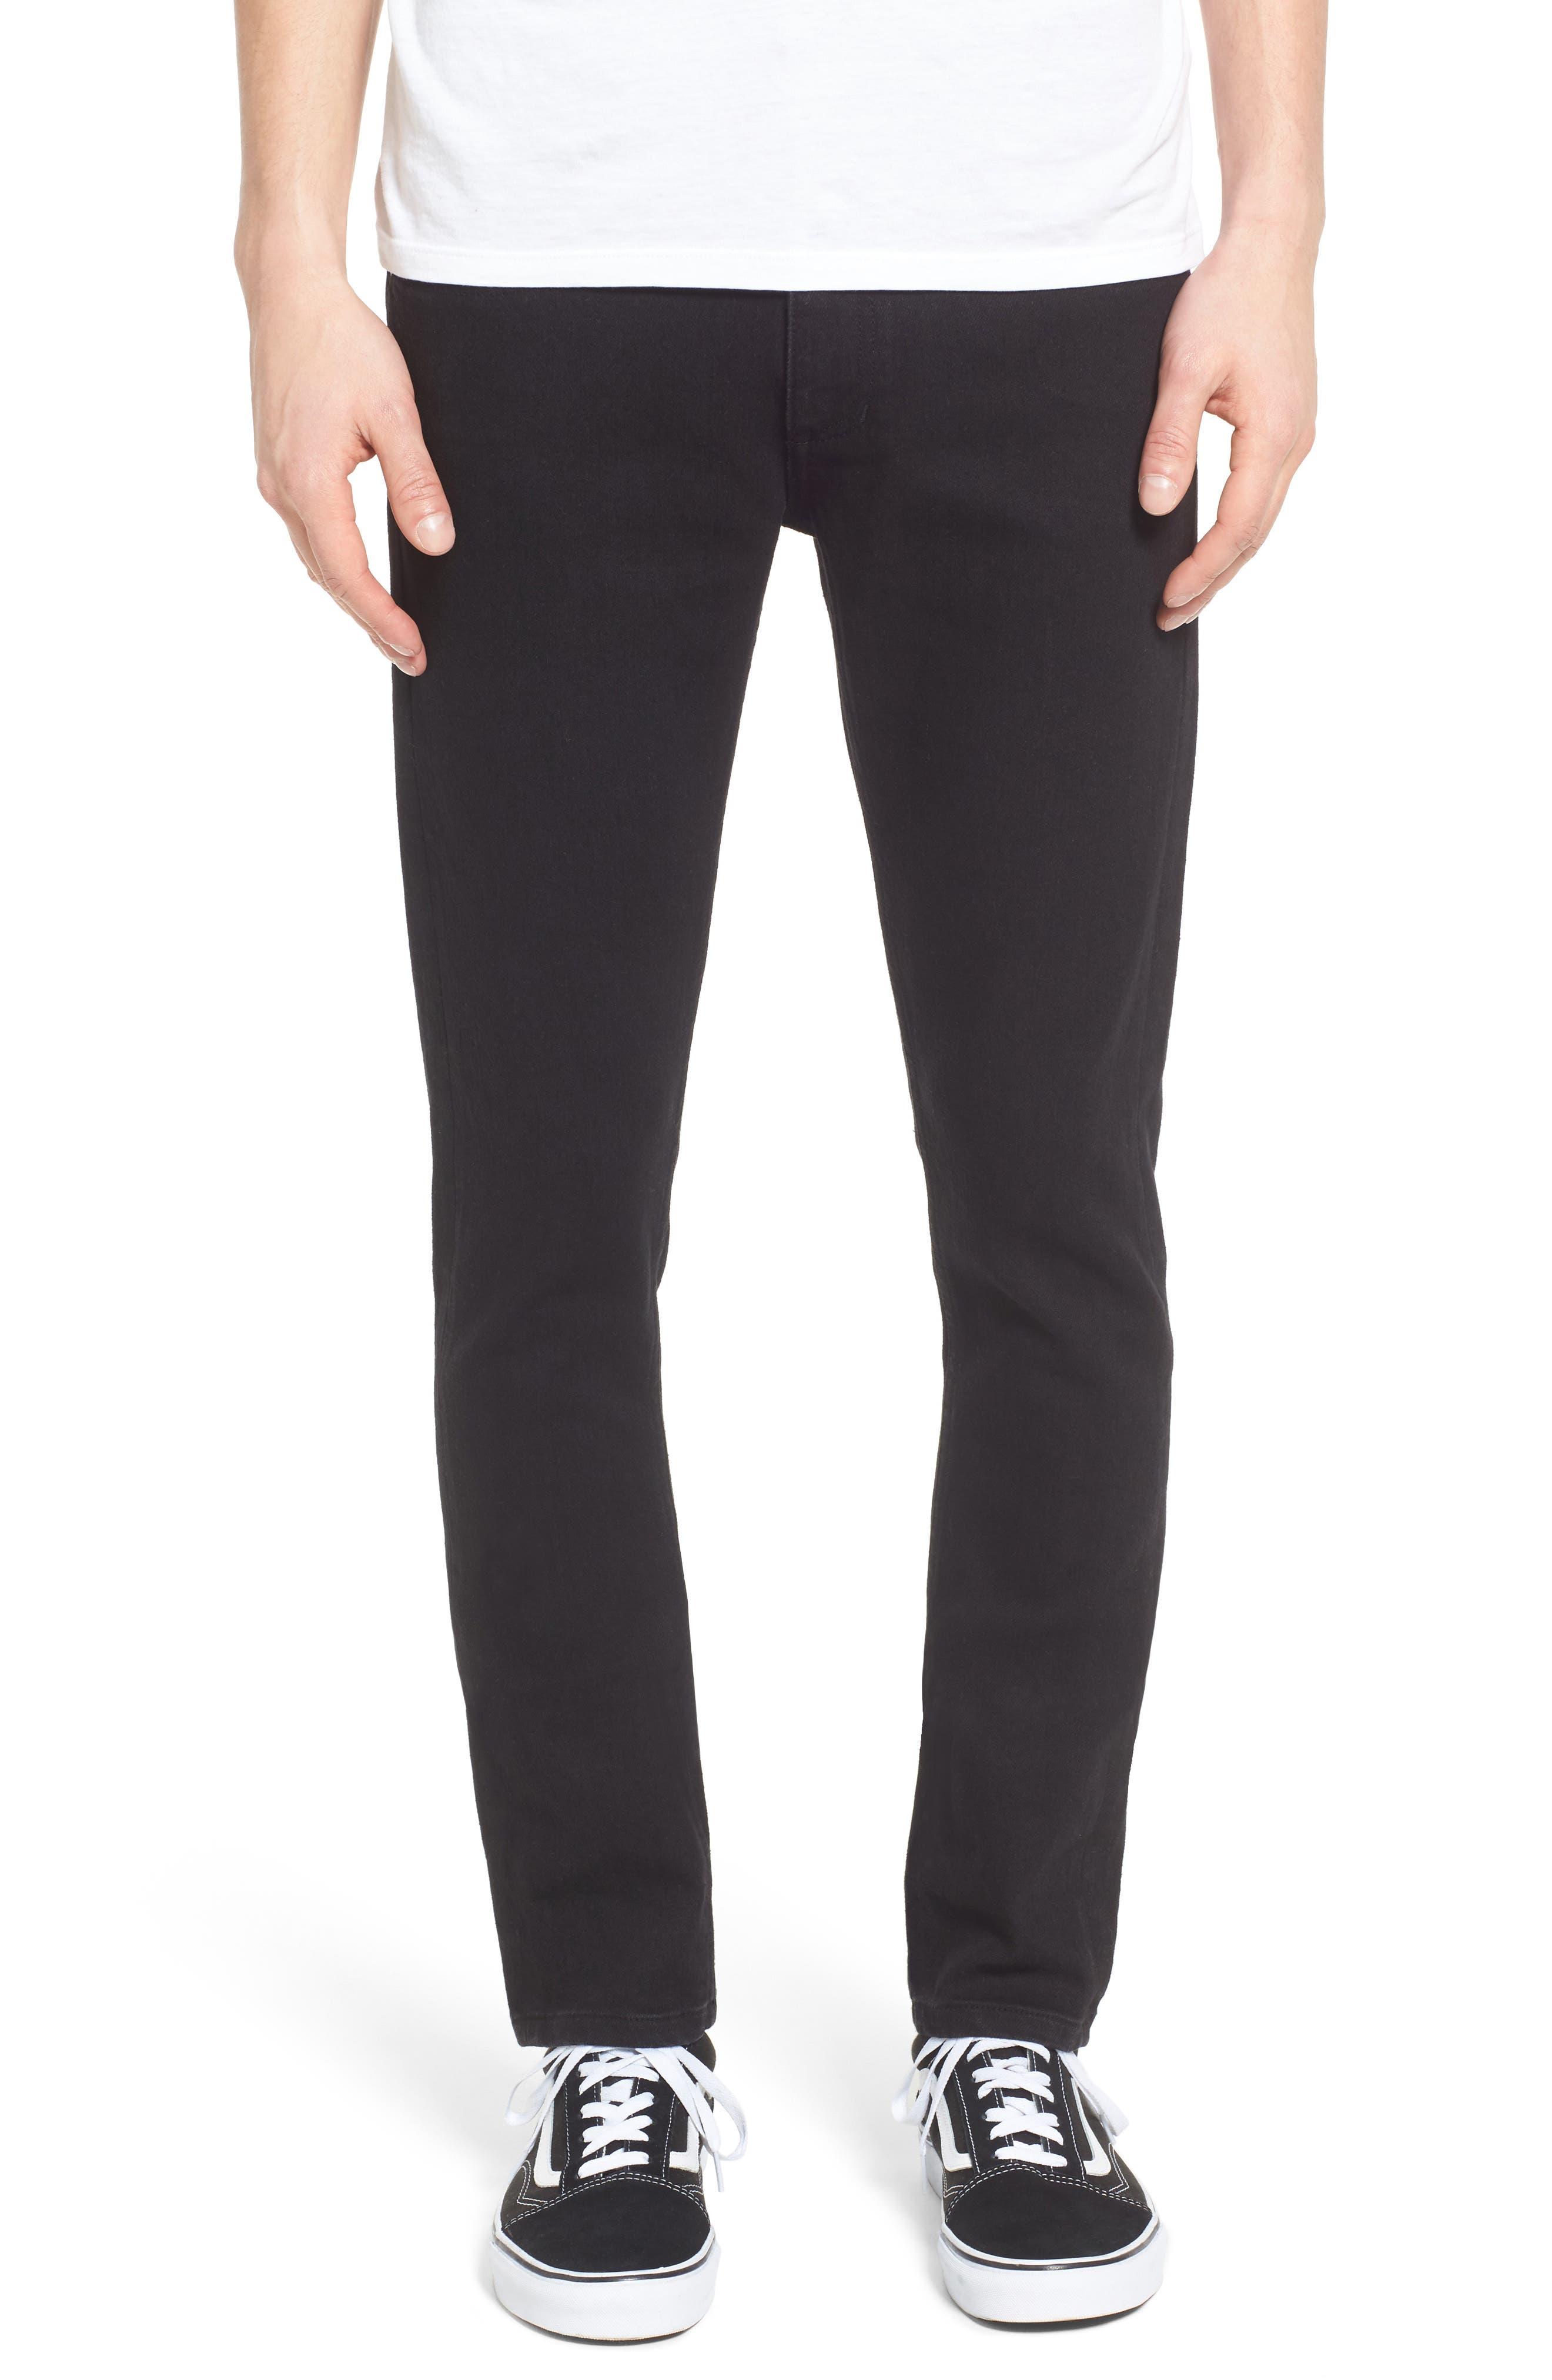 Juvee II Skinny Fit Jeans,                         Main,                         color, Black